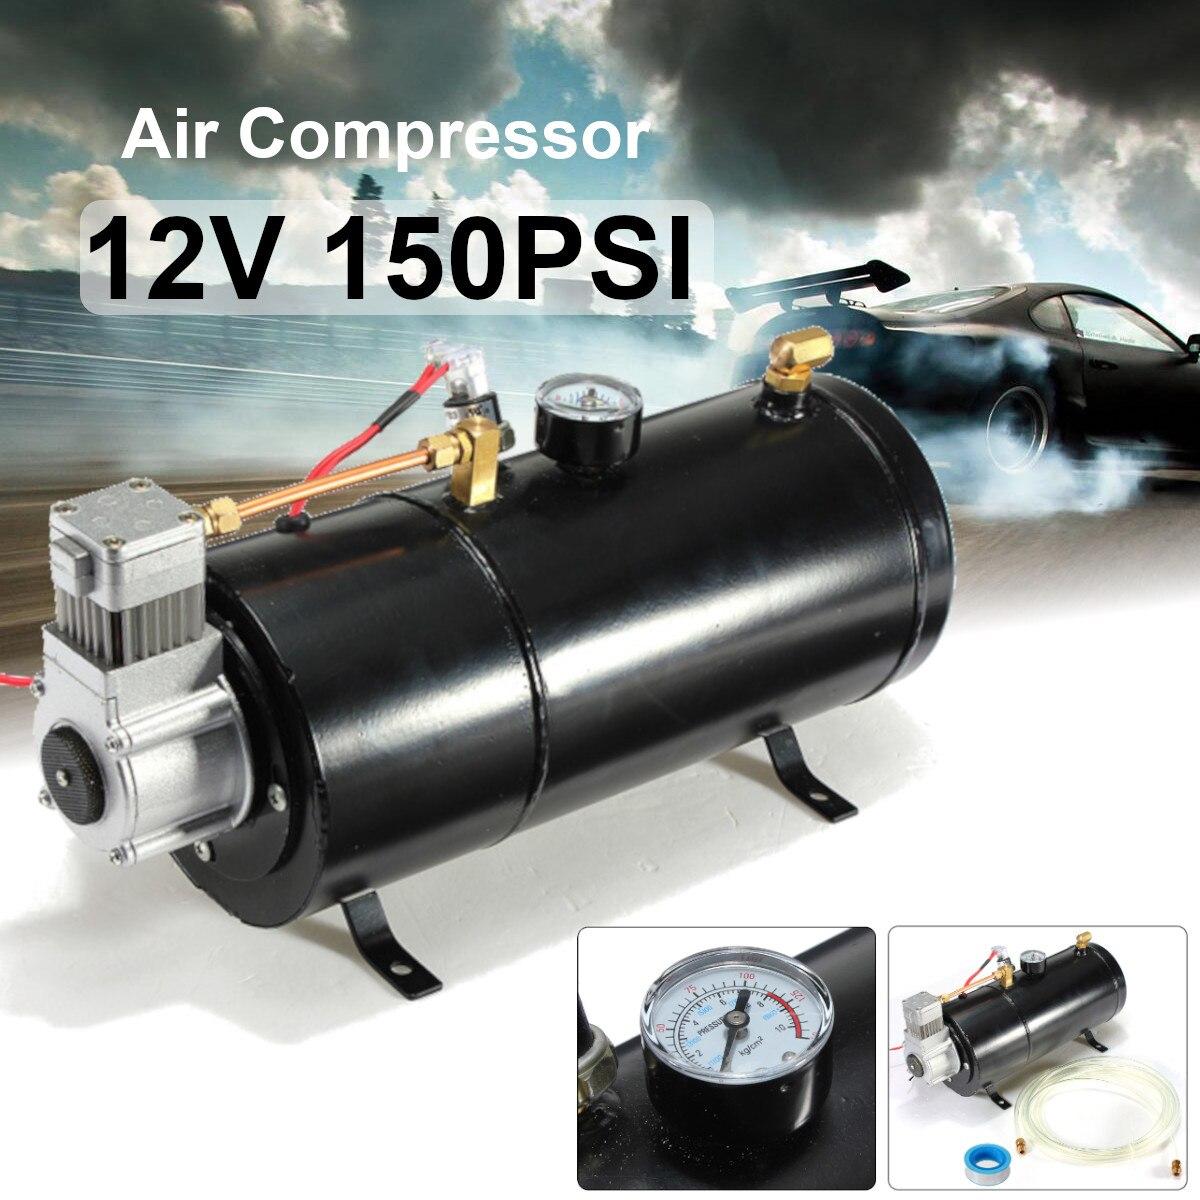 12 Volt 150 PSI Air Compressor 0 7 Gallon Tank Pump For Air Horn Vehicle Truck